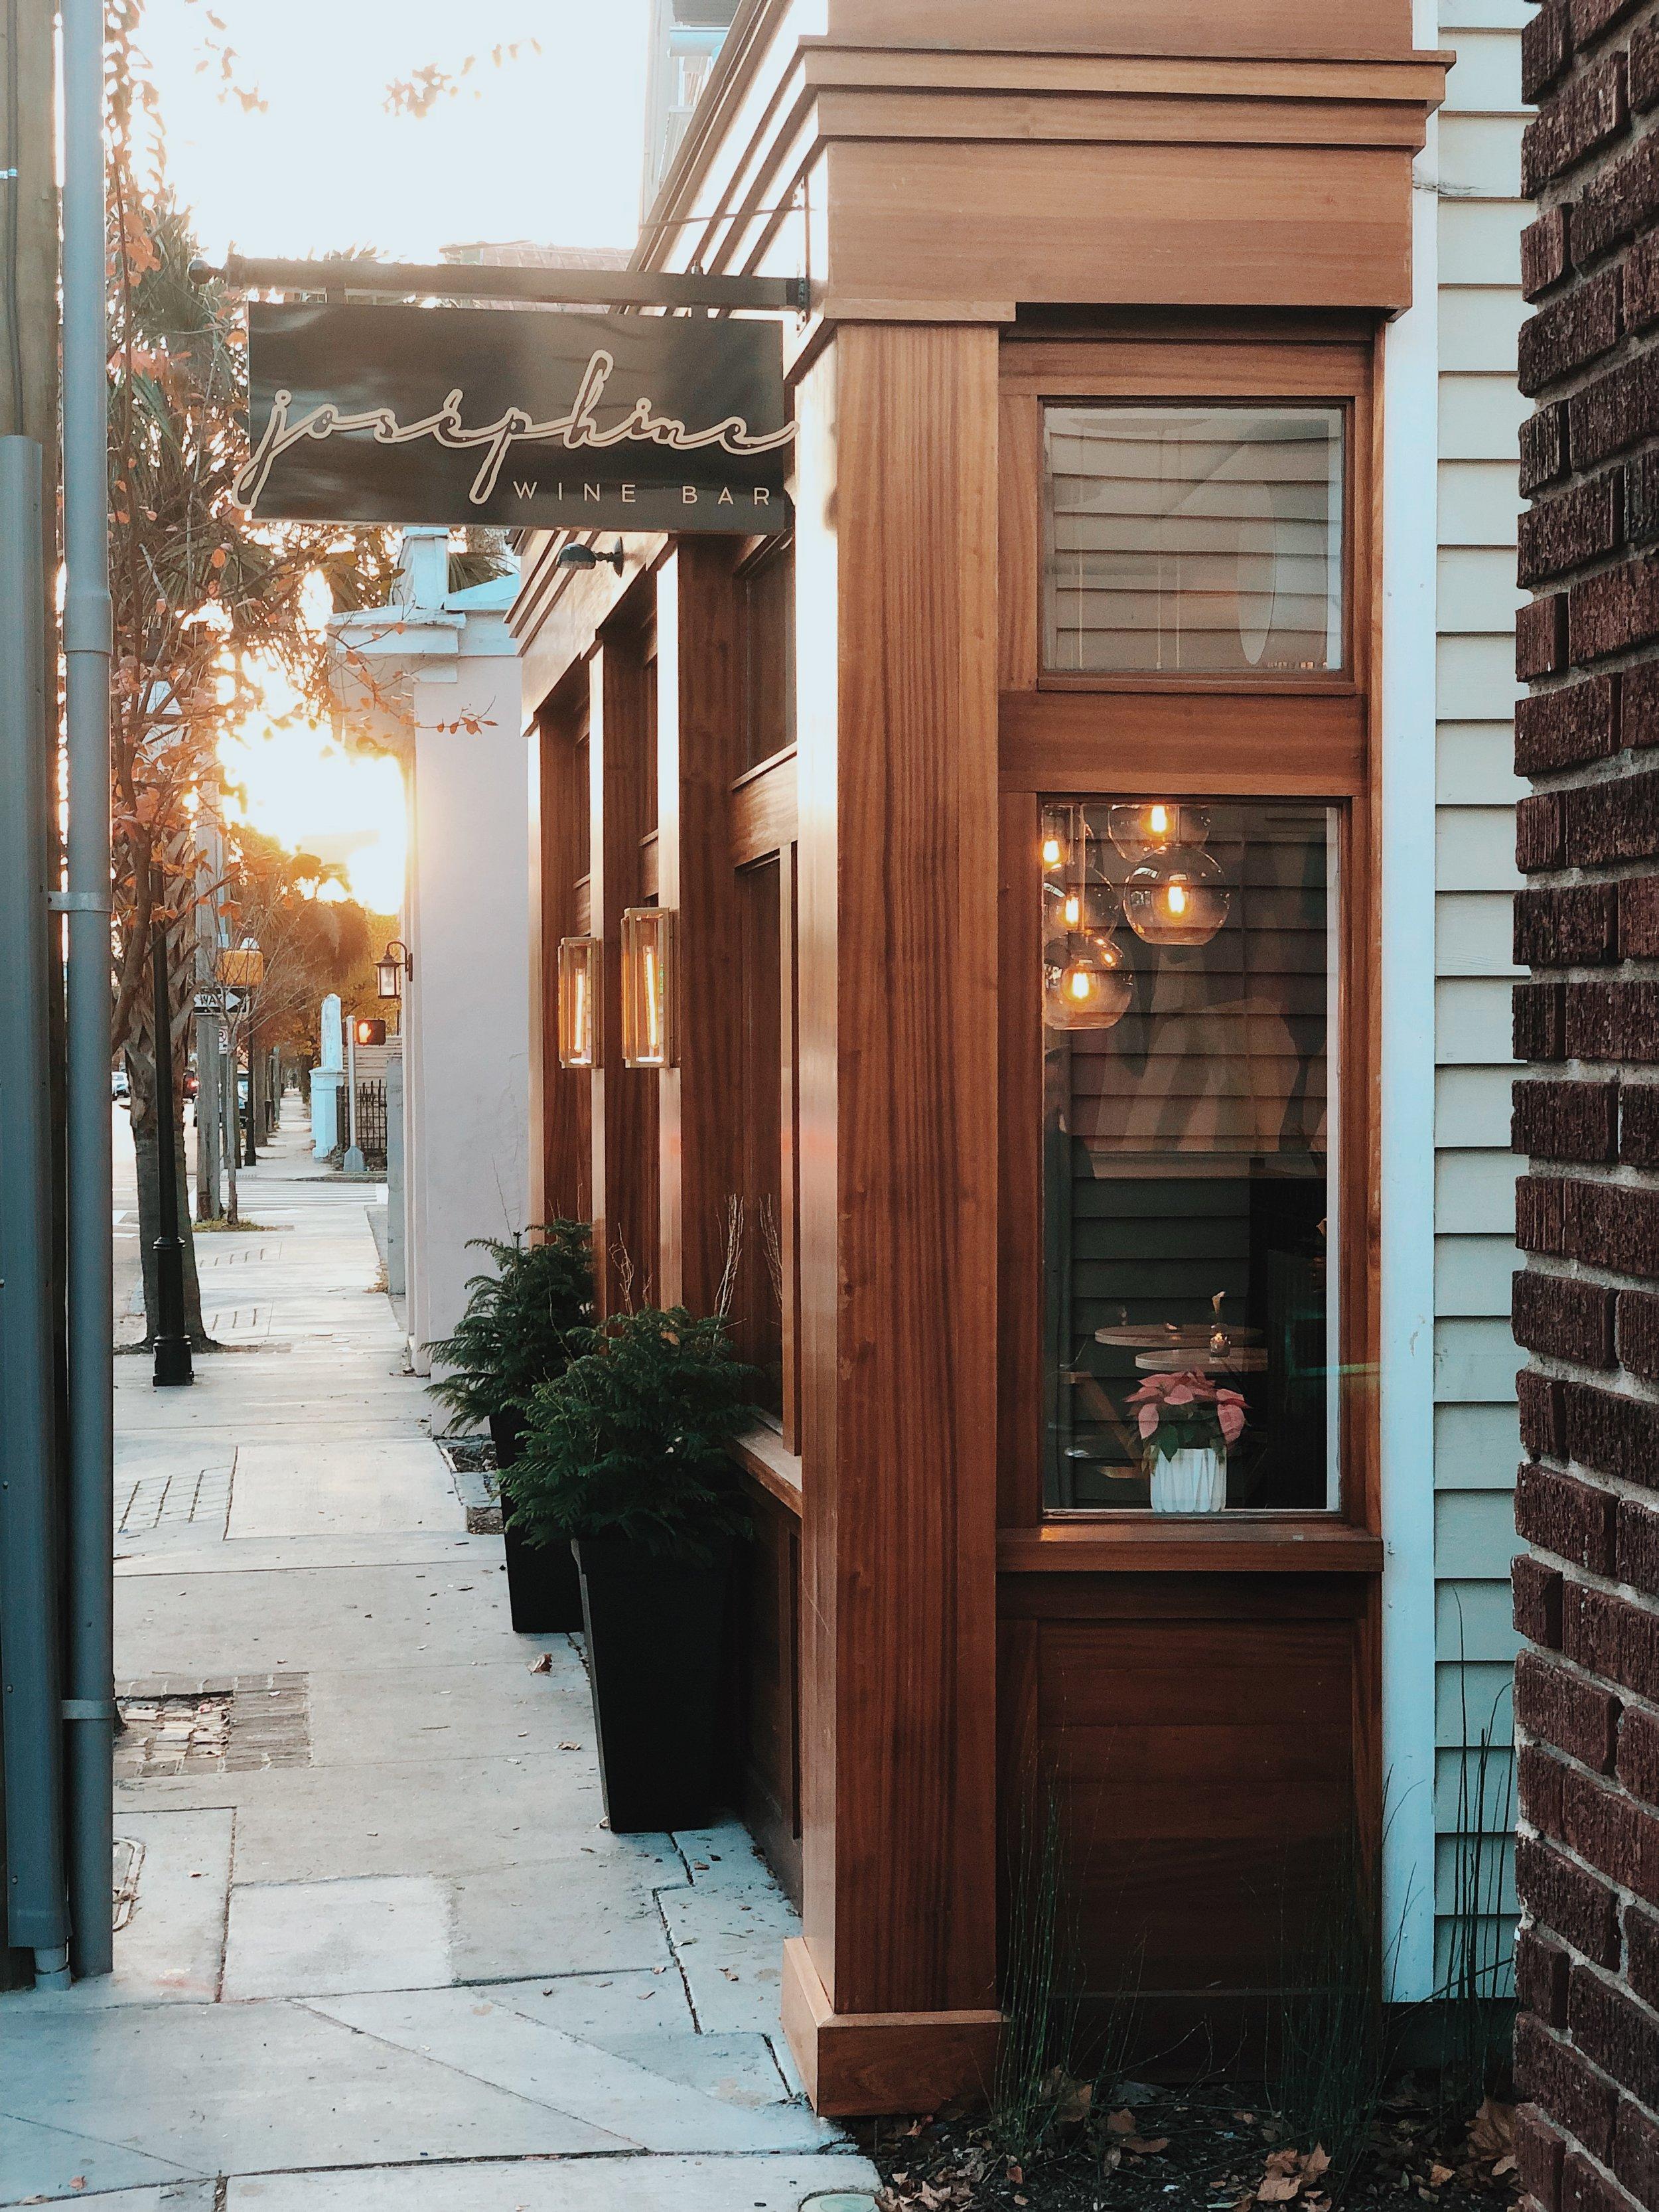 I Love That For You - Josephine Wine Bar Exterior Entrance.jpg